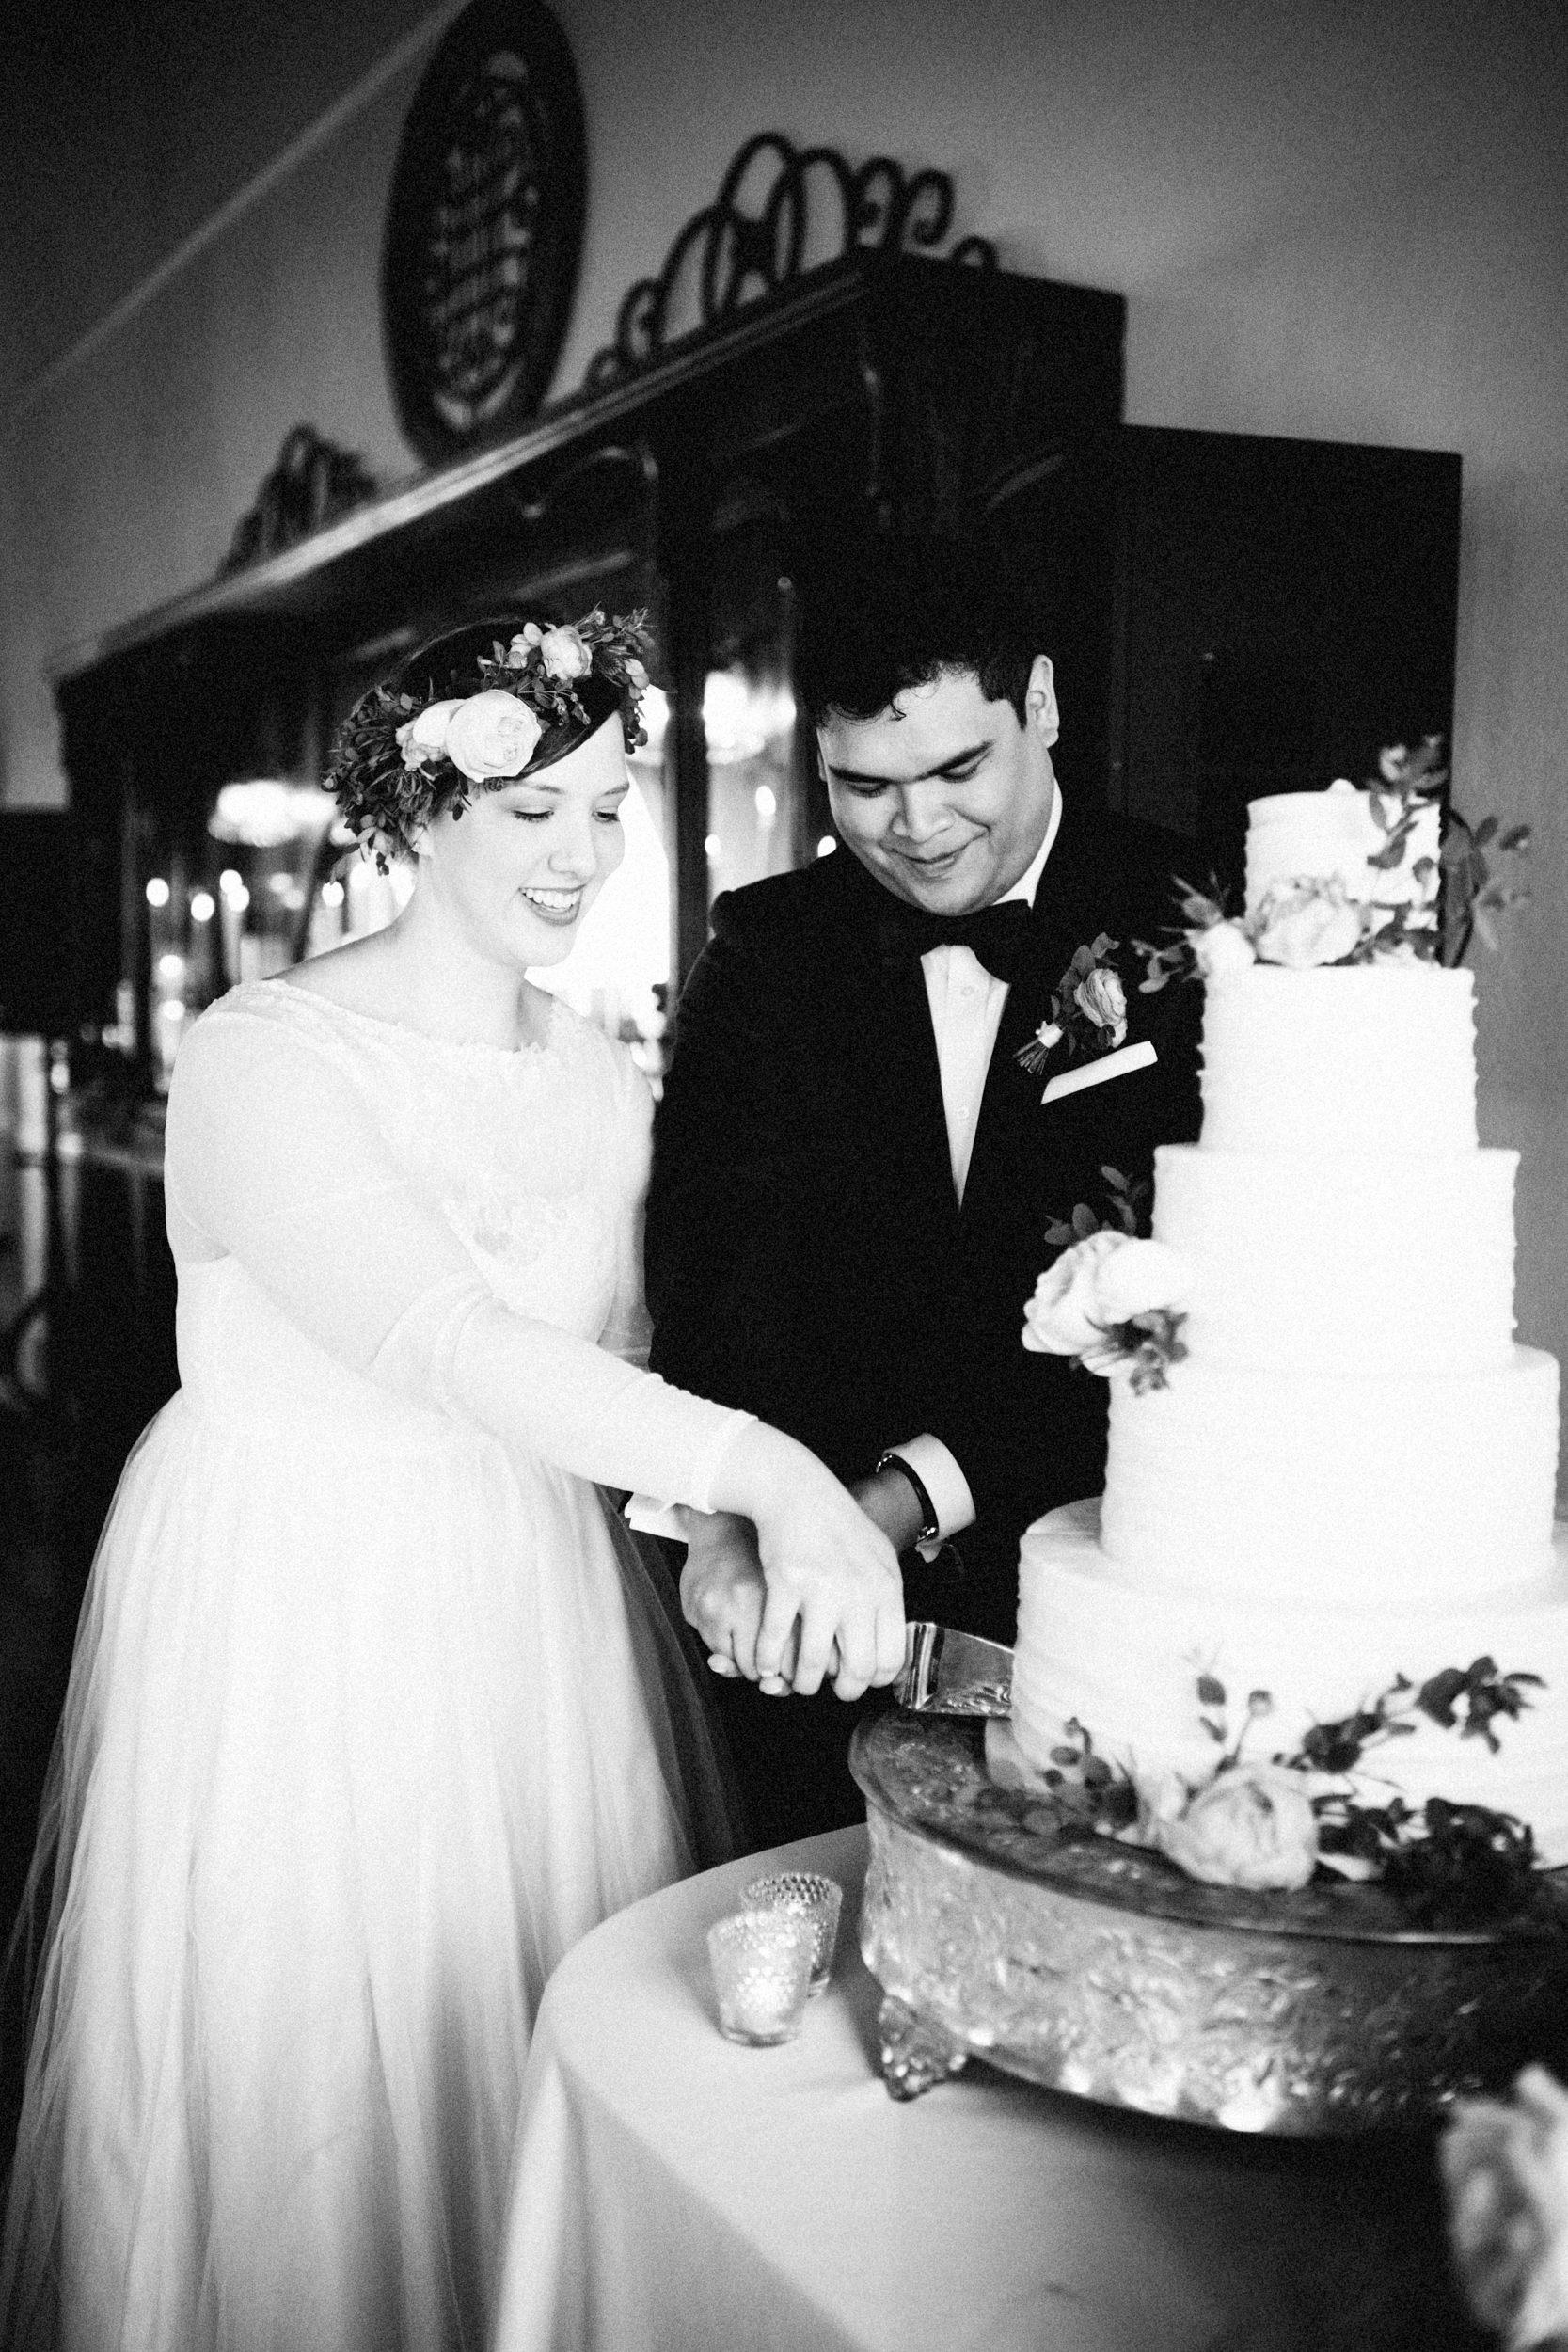 lauren-dean-wedding-grand-lodge-kentucky-sarah-katherine-davis-photography-493edit.jpg